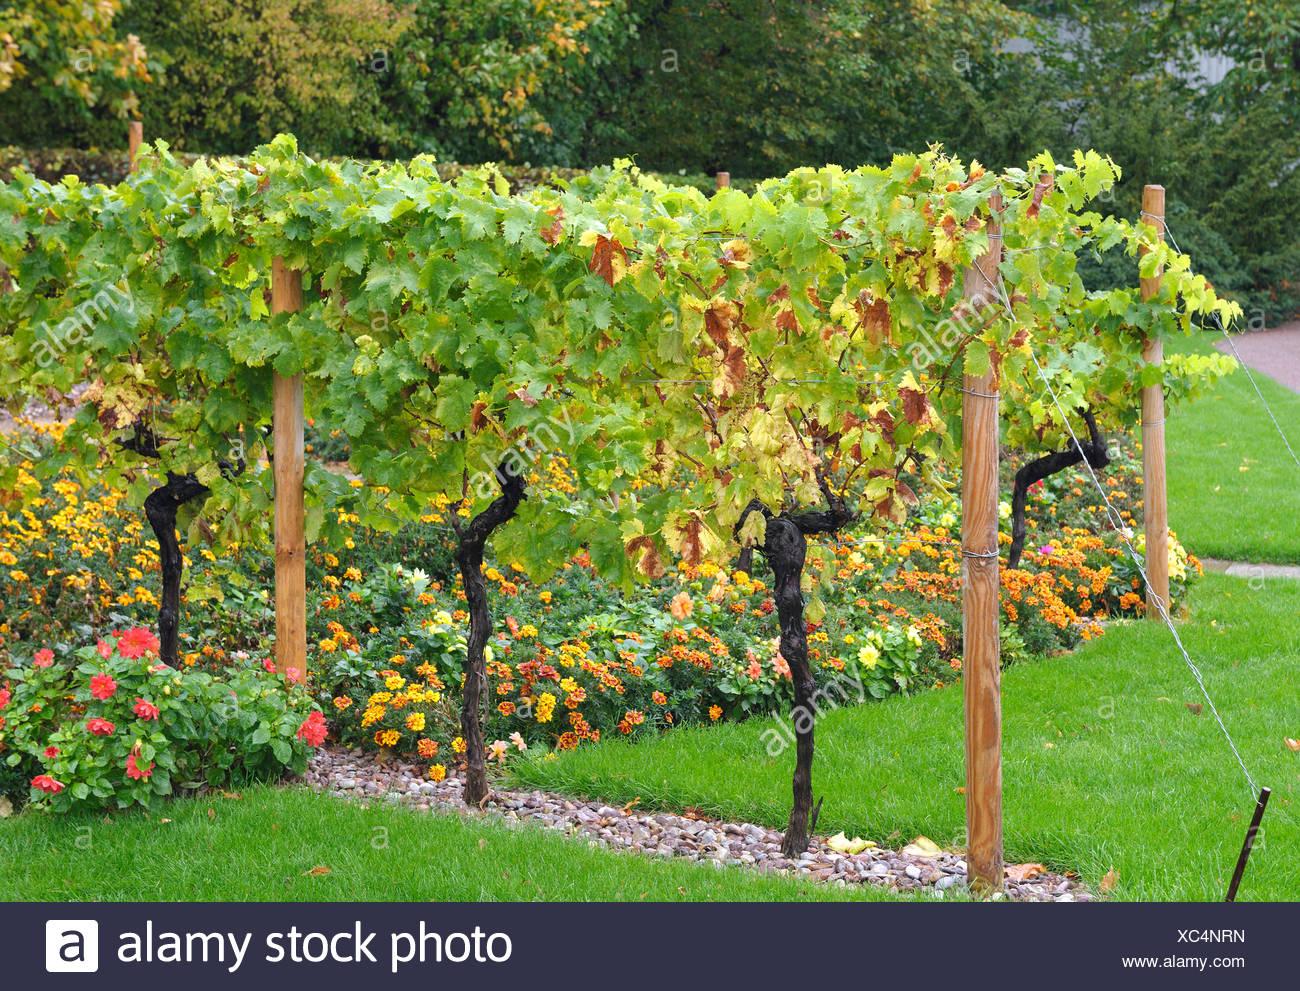 grape-vine, vine (Vitis vinifera), vine espalier, Germany - Stock Image